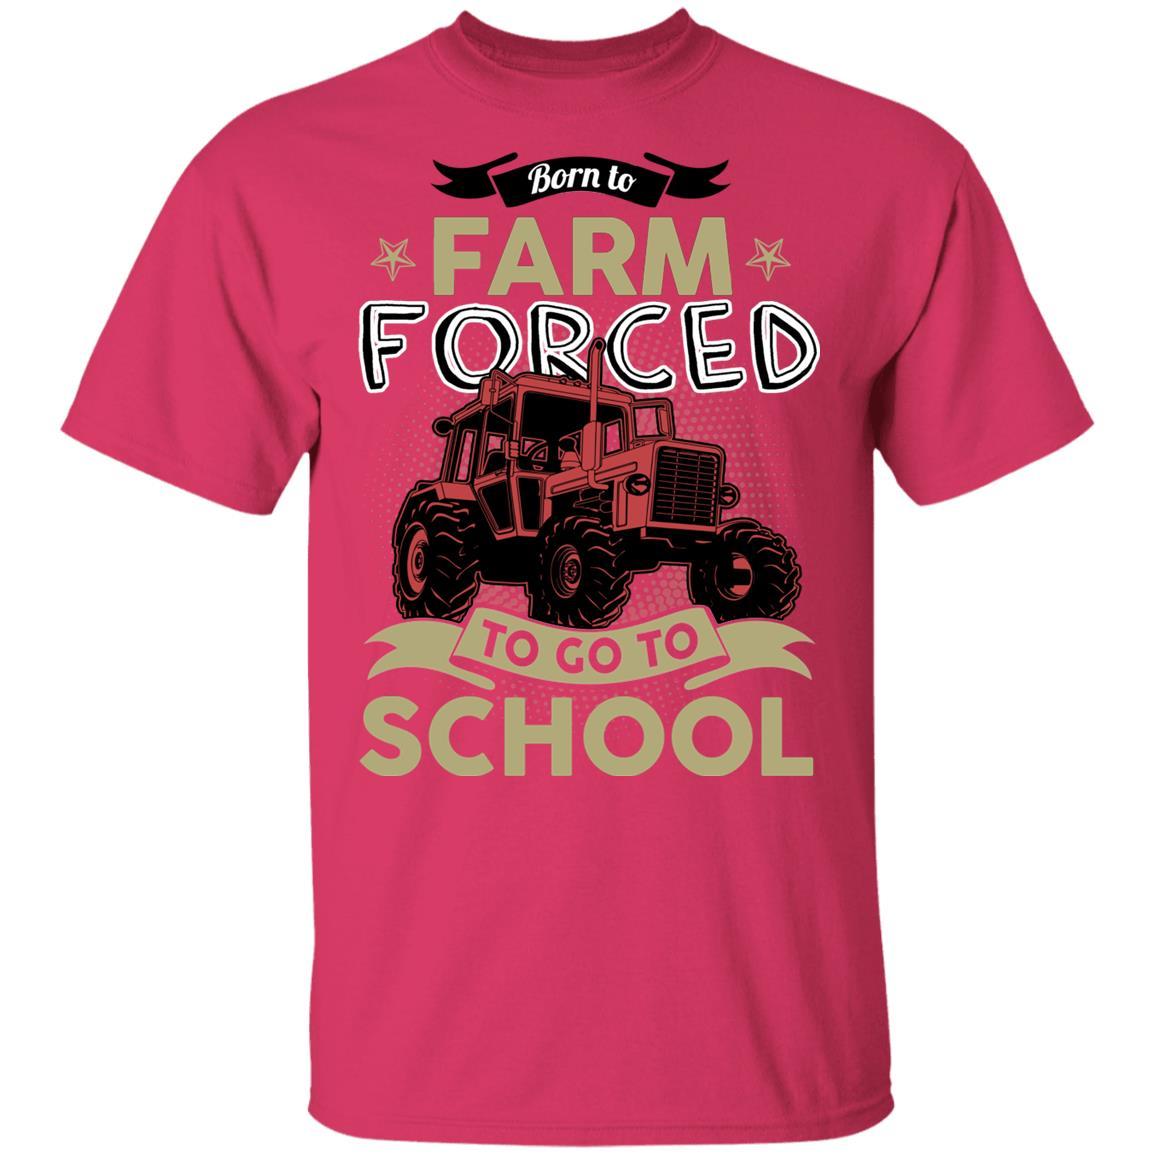 Princess Tractor-Women/'s shirt Farmer shirt \u00b7 Trecker \u00b7 Tractor \u00b7 Gift for farmers \u00b7 Same